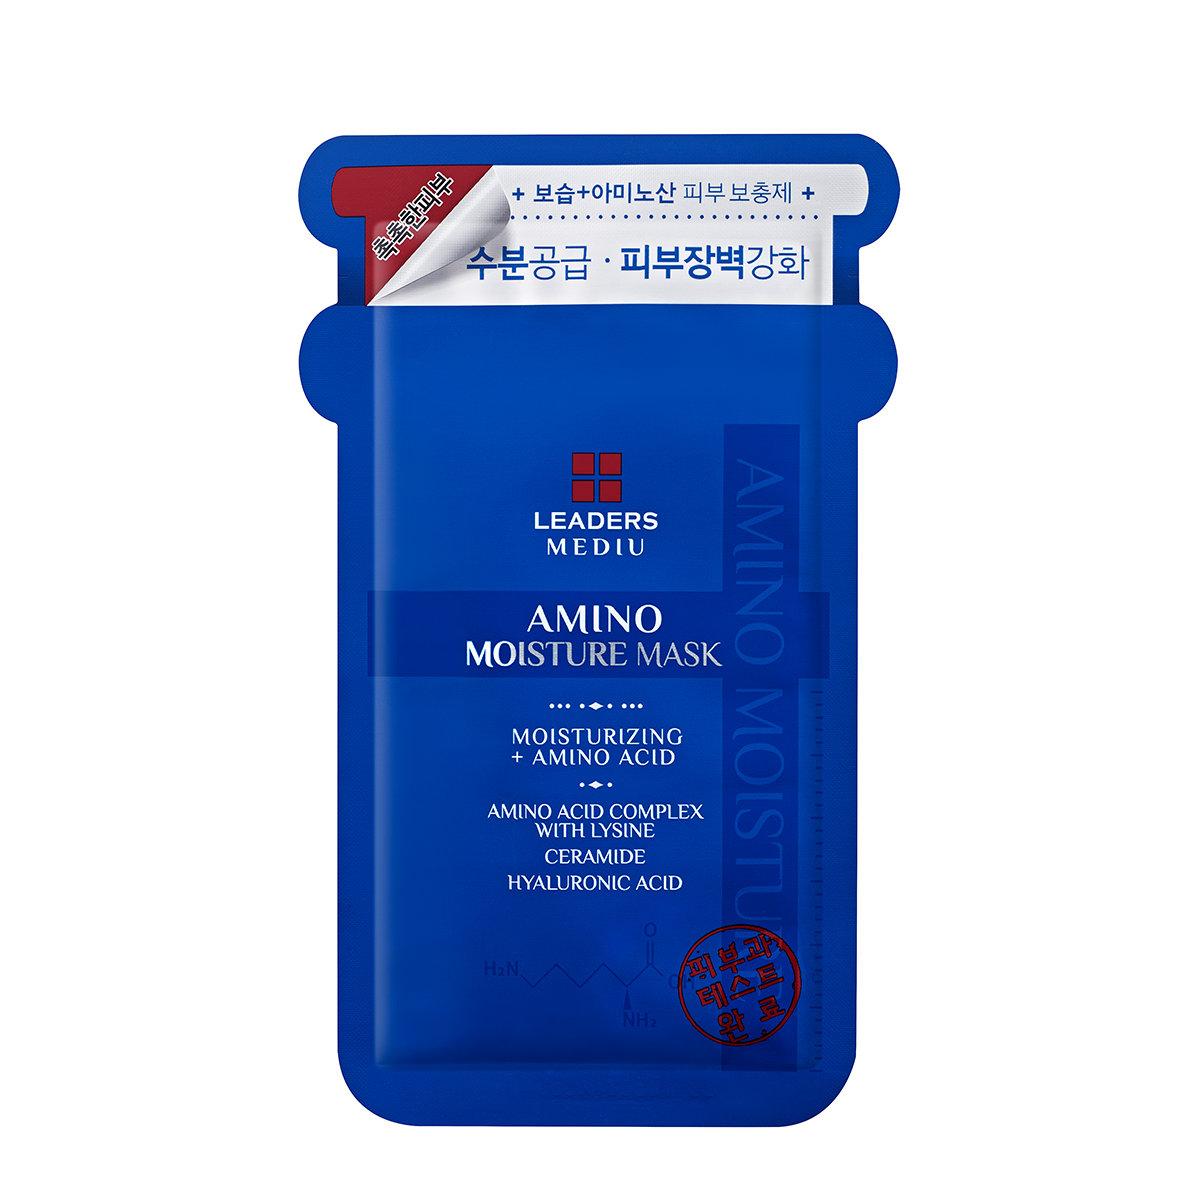 Mediu Amino Moisture Mask 10pcs [Parallel Import] (8809242199341)